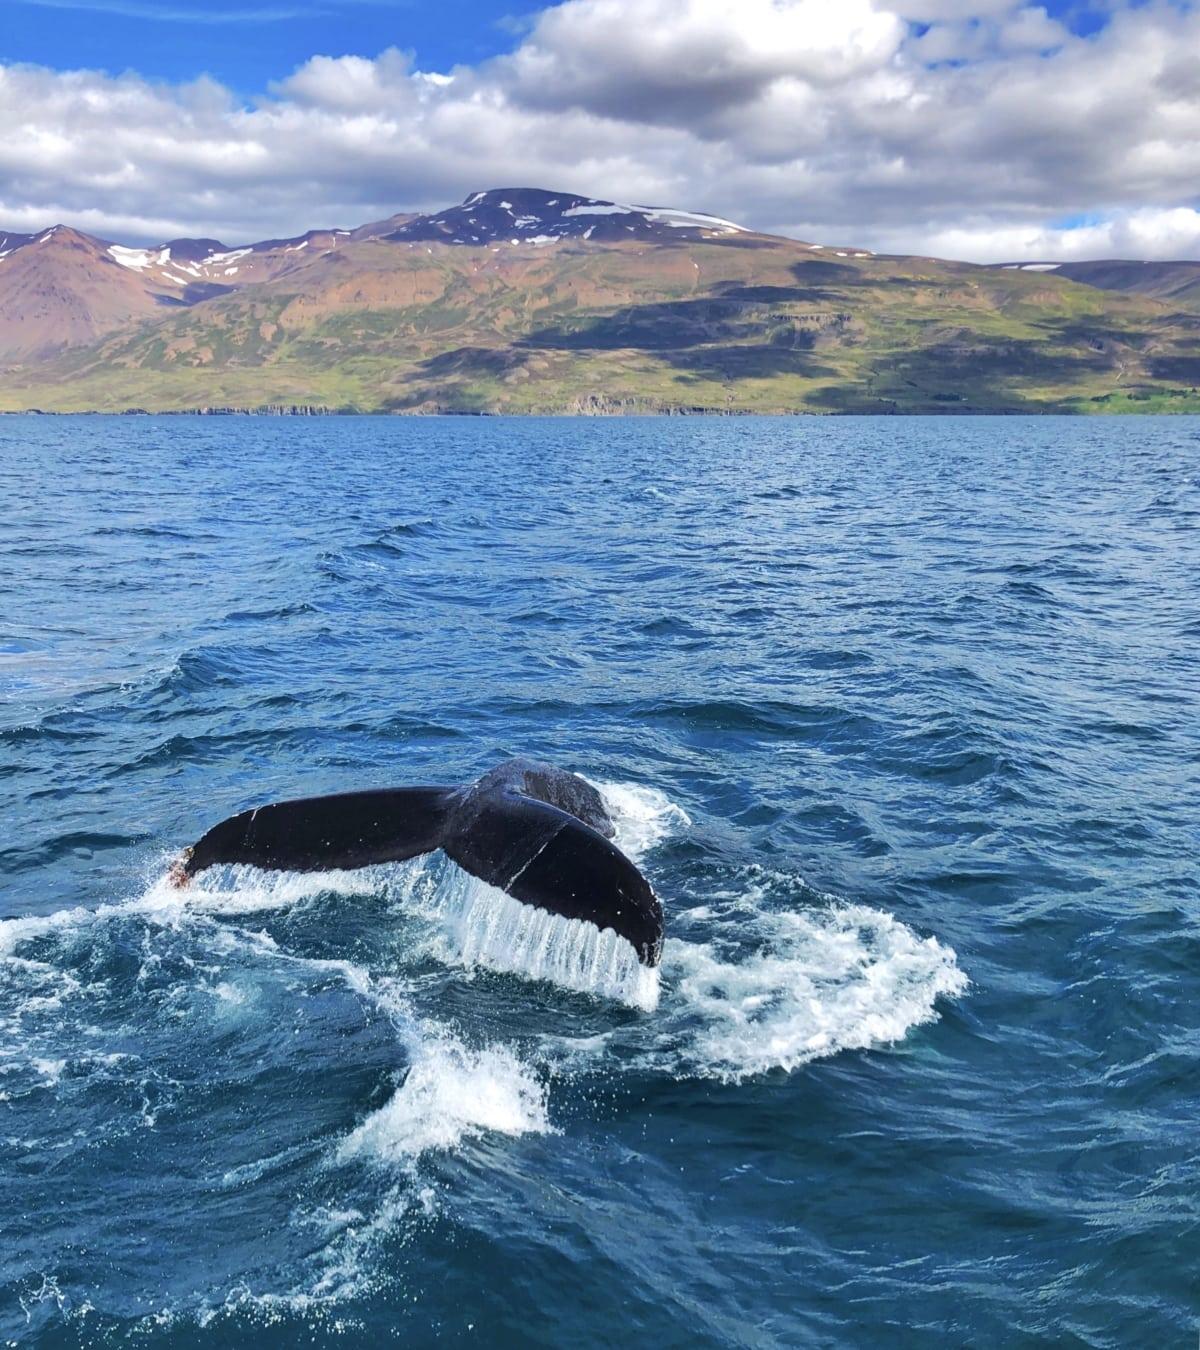 Balena Islanda